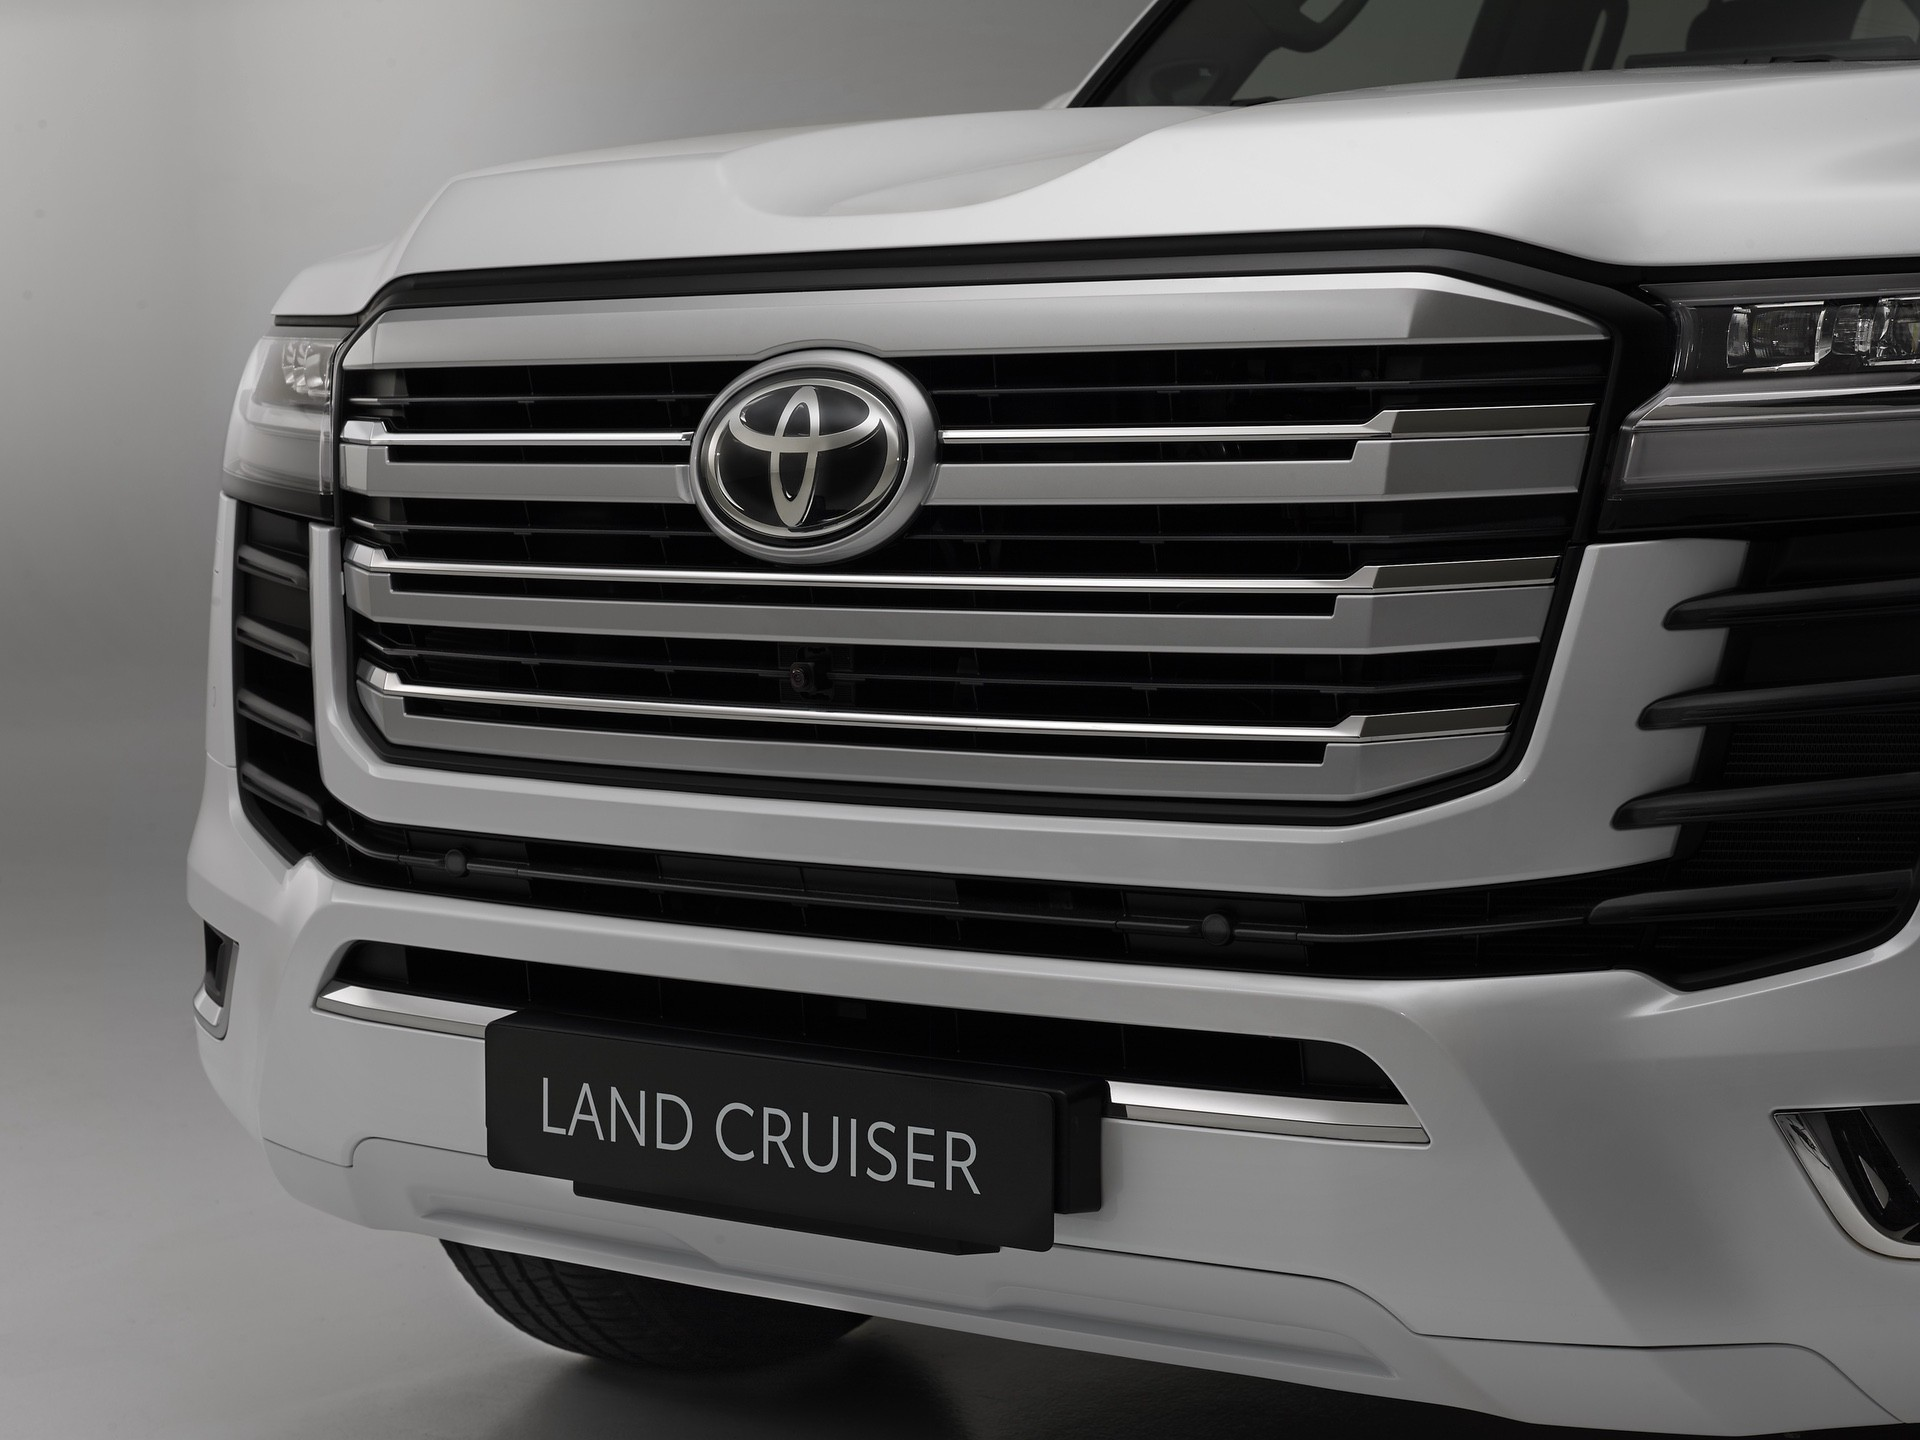 2021_Toyota_Land_Cruiser-0007